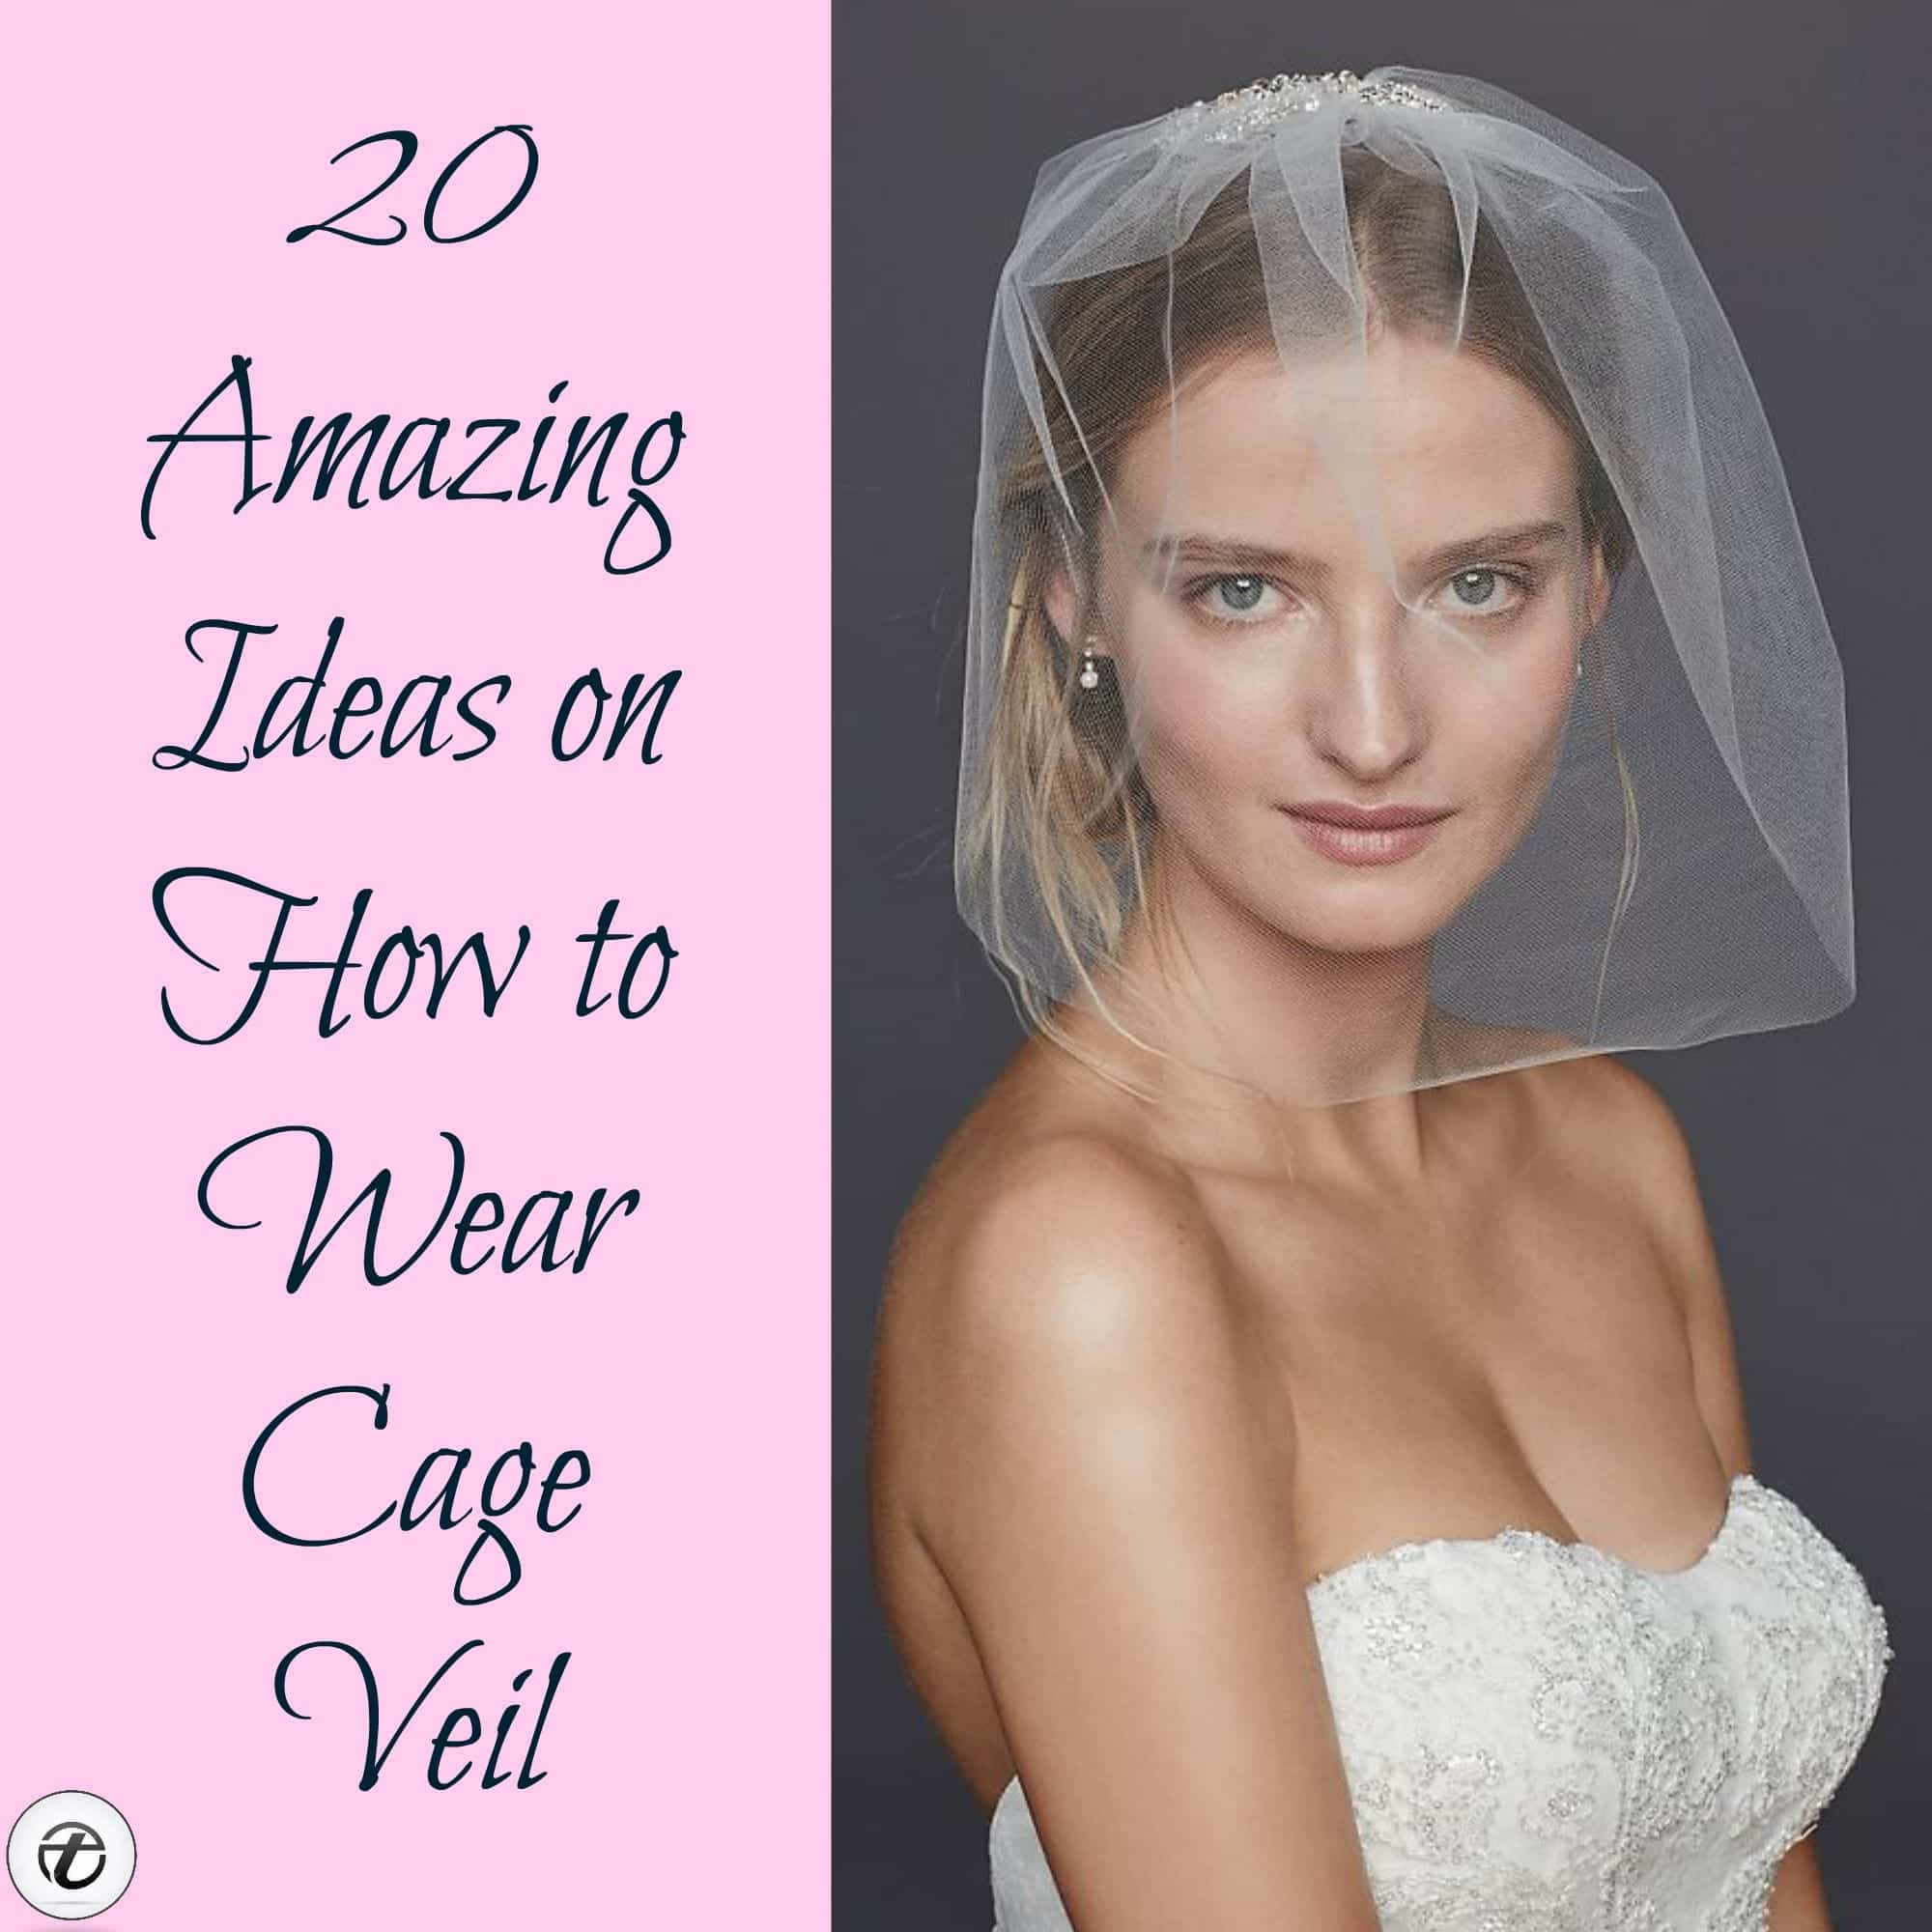 Bridal Birdcage Veil- 20 Best Ideas on How to Wear Cage Veil